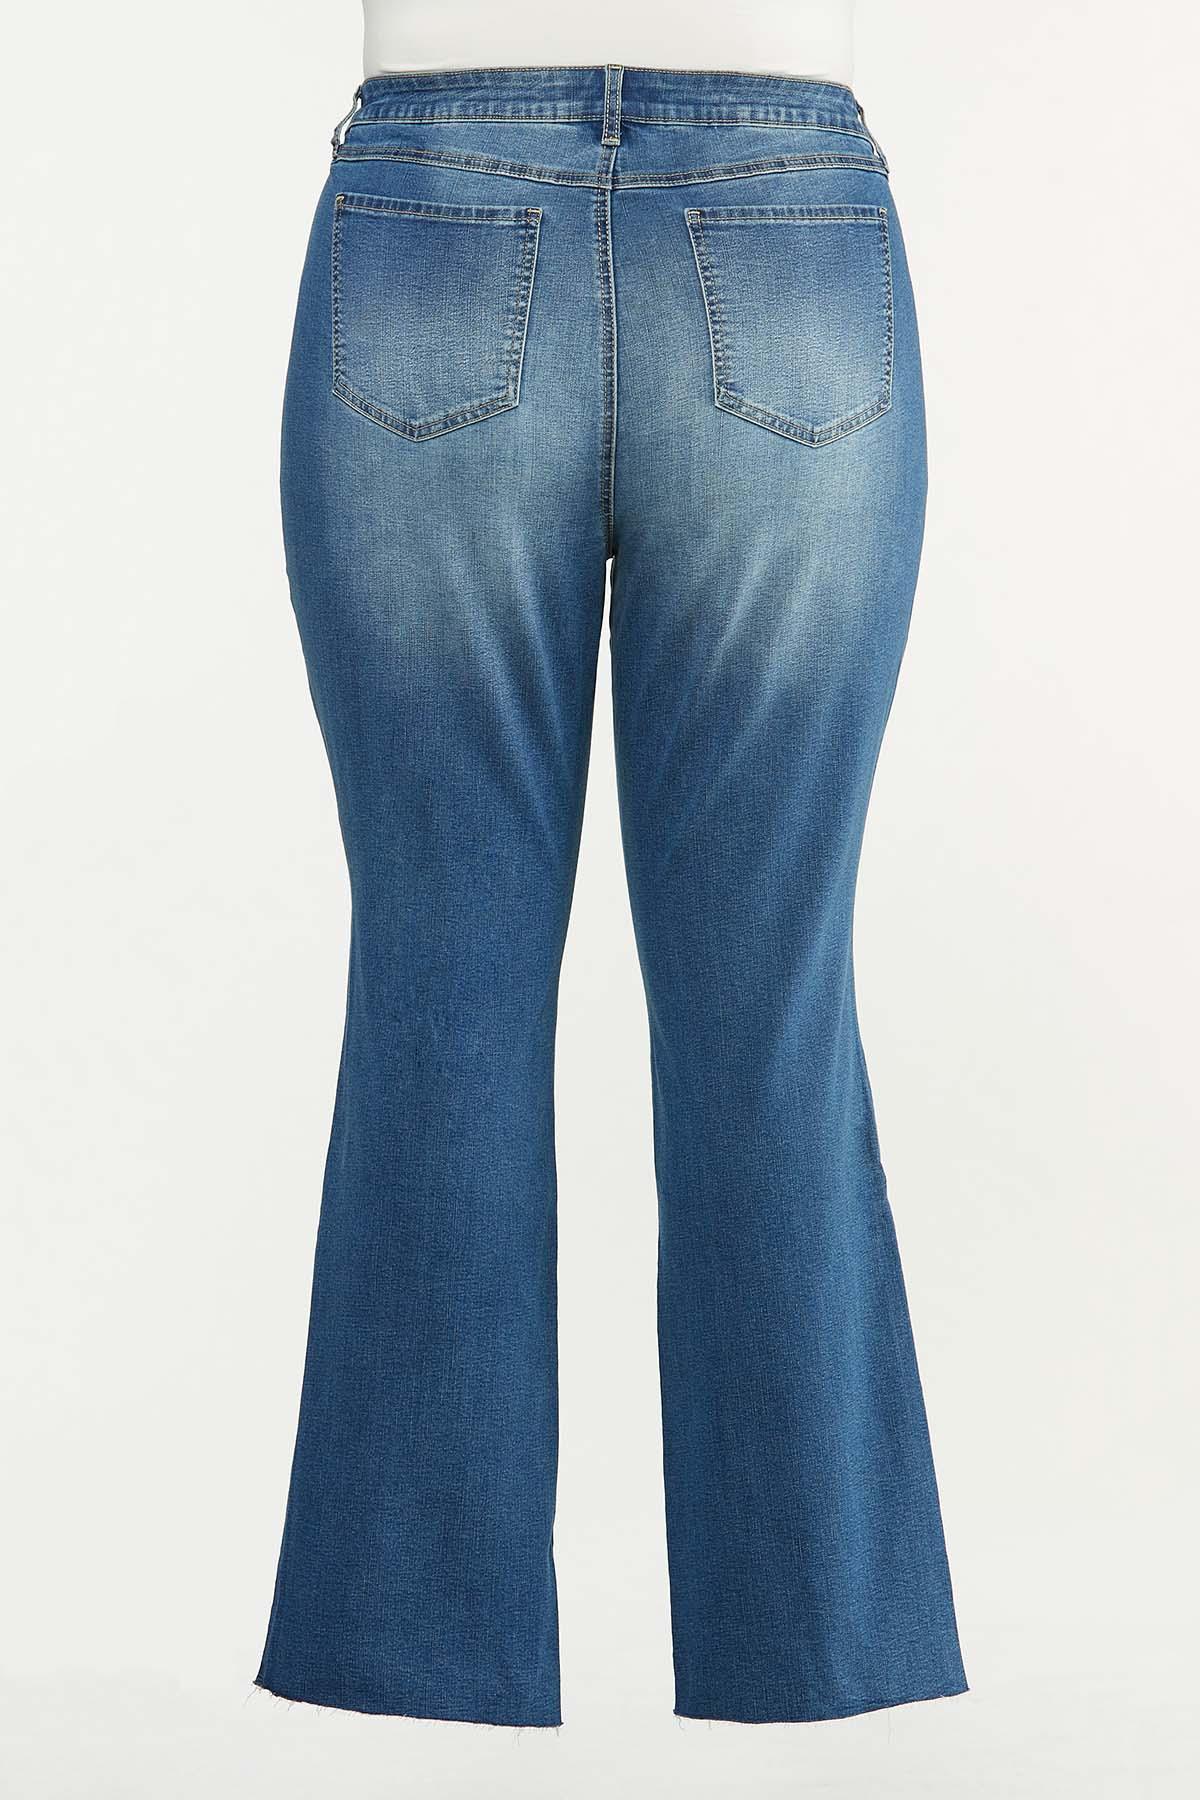 Plus Size Bootcut Raw Hem Jeans (Item #44659179)